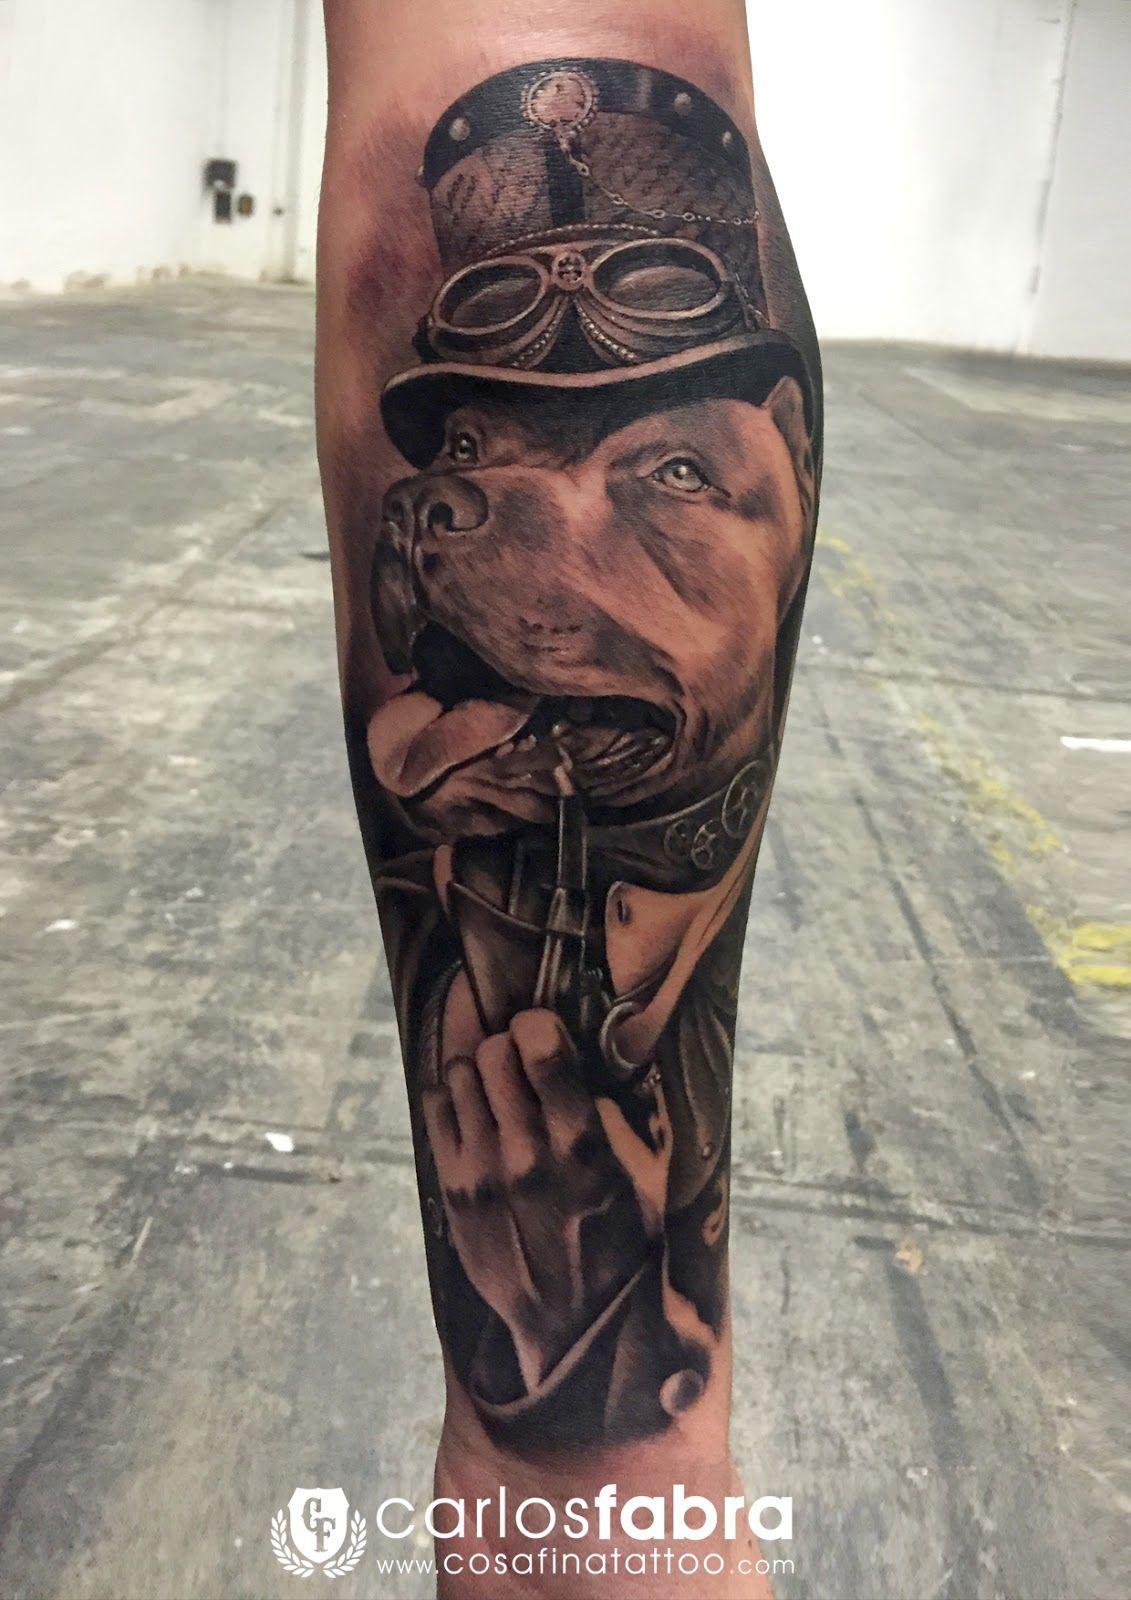 CosaFina tattoo Carlos Art Studio: tatuaje perro humano ...